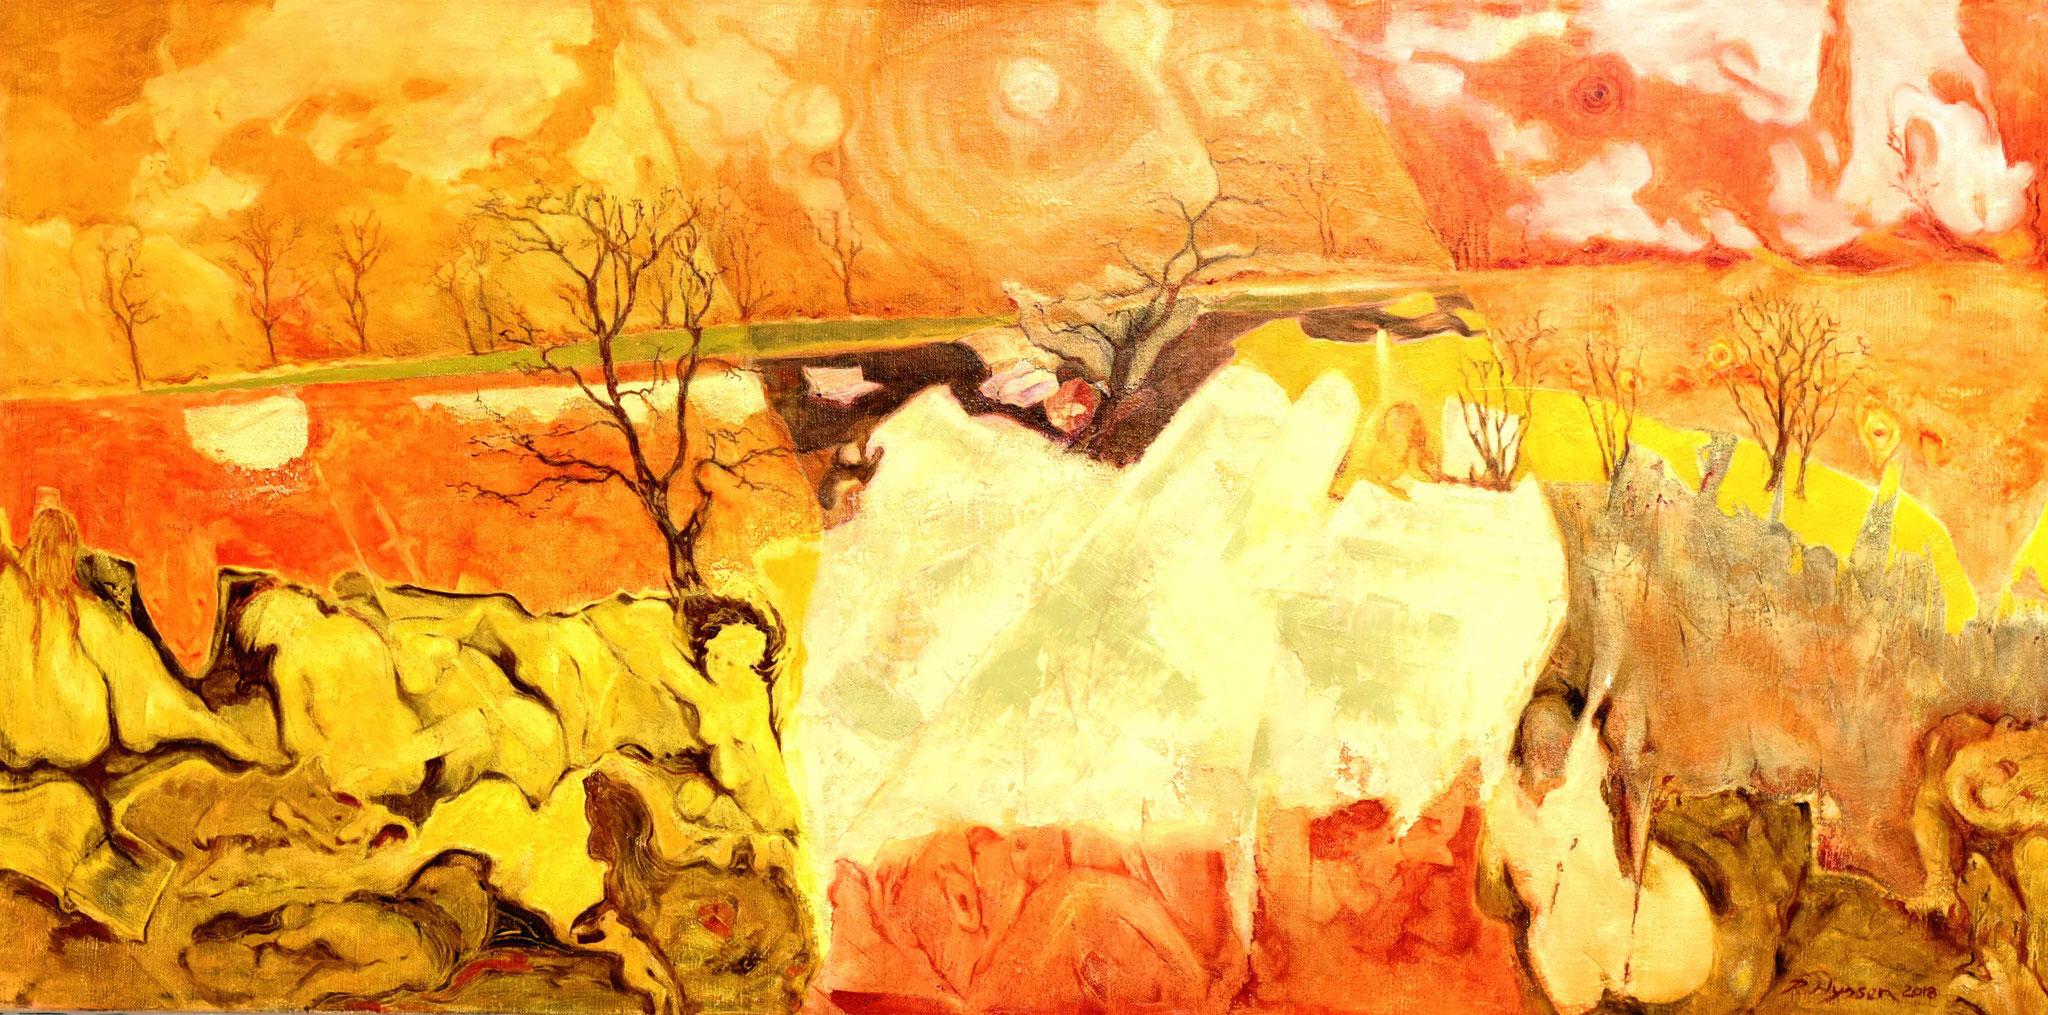 """Trisolaris I""-2018-Öl auf LW-80-160cm / oil on canvas"